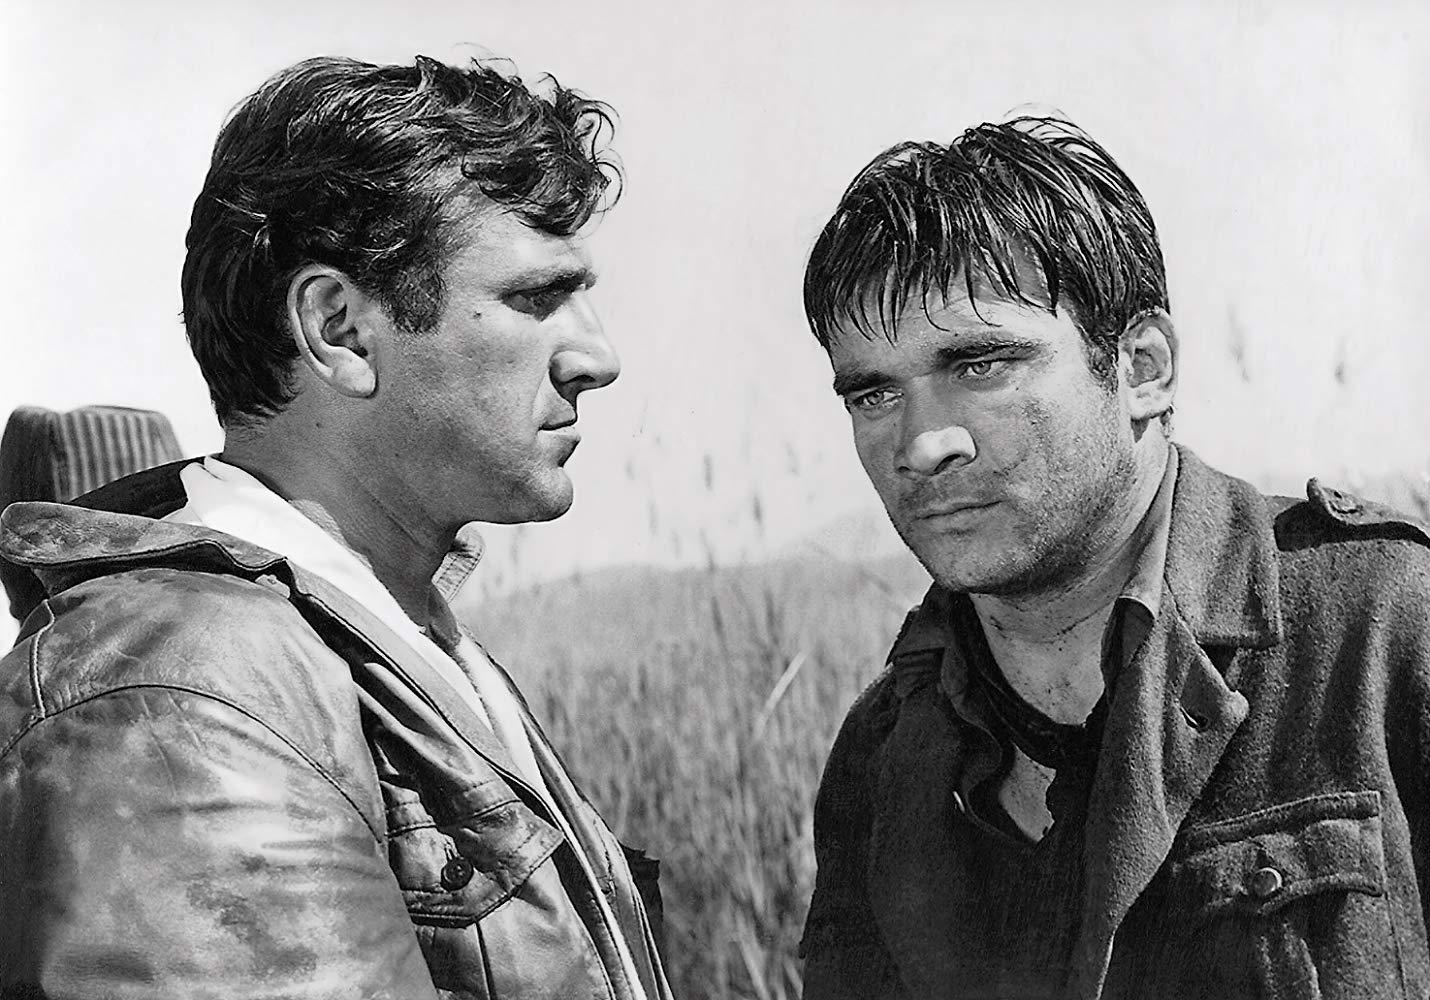 Bata Živojinović e Boris Dvornik in una scena del film Most